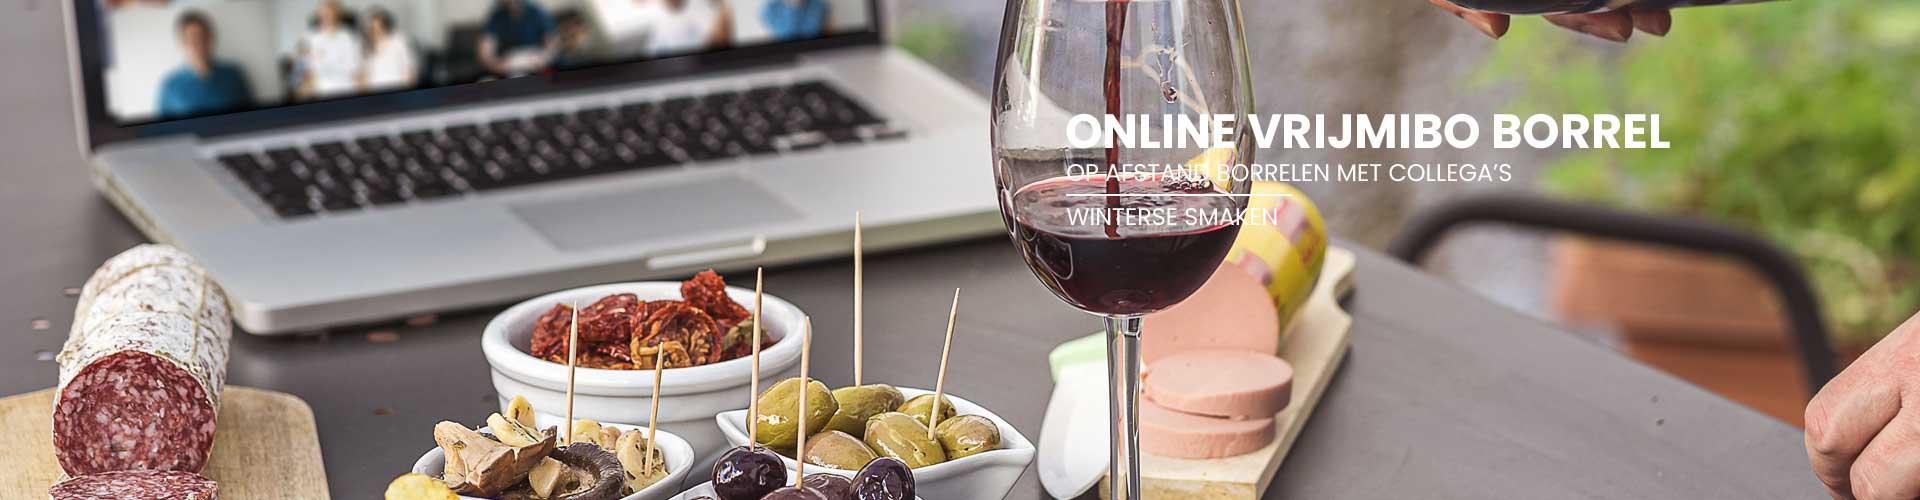 online Vrijmibo borrel